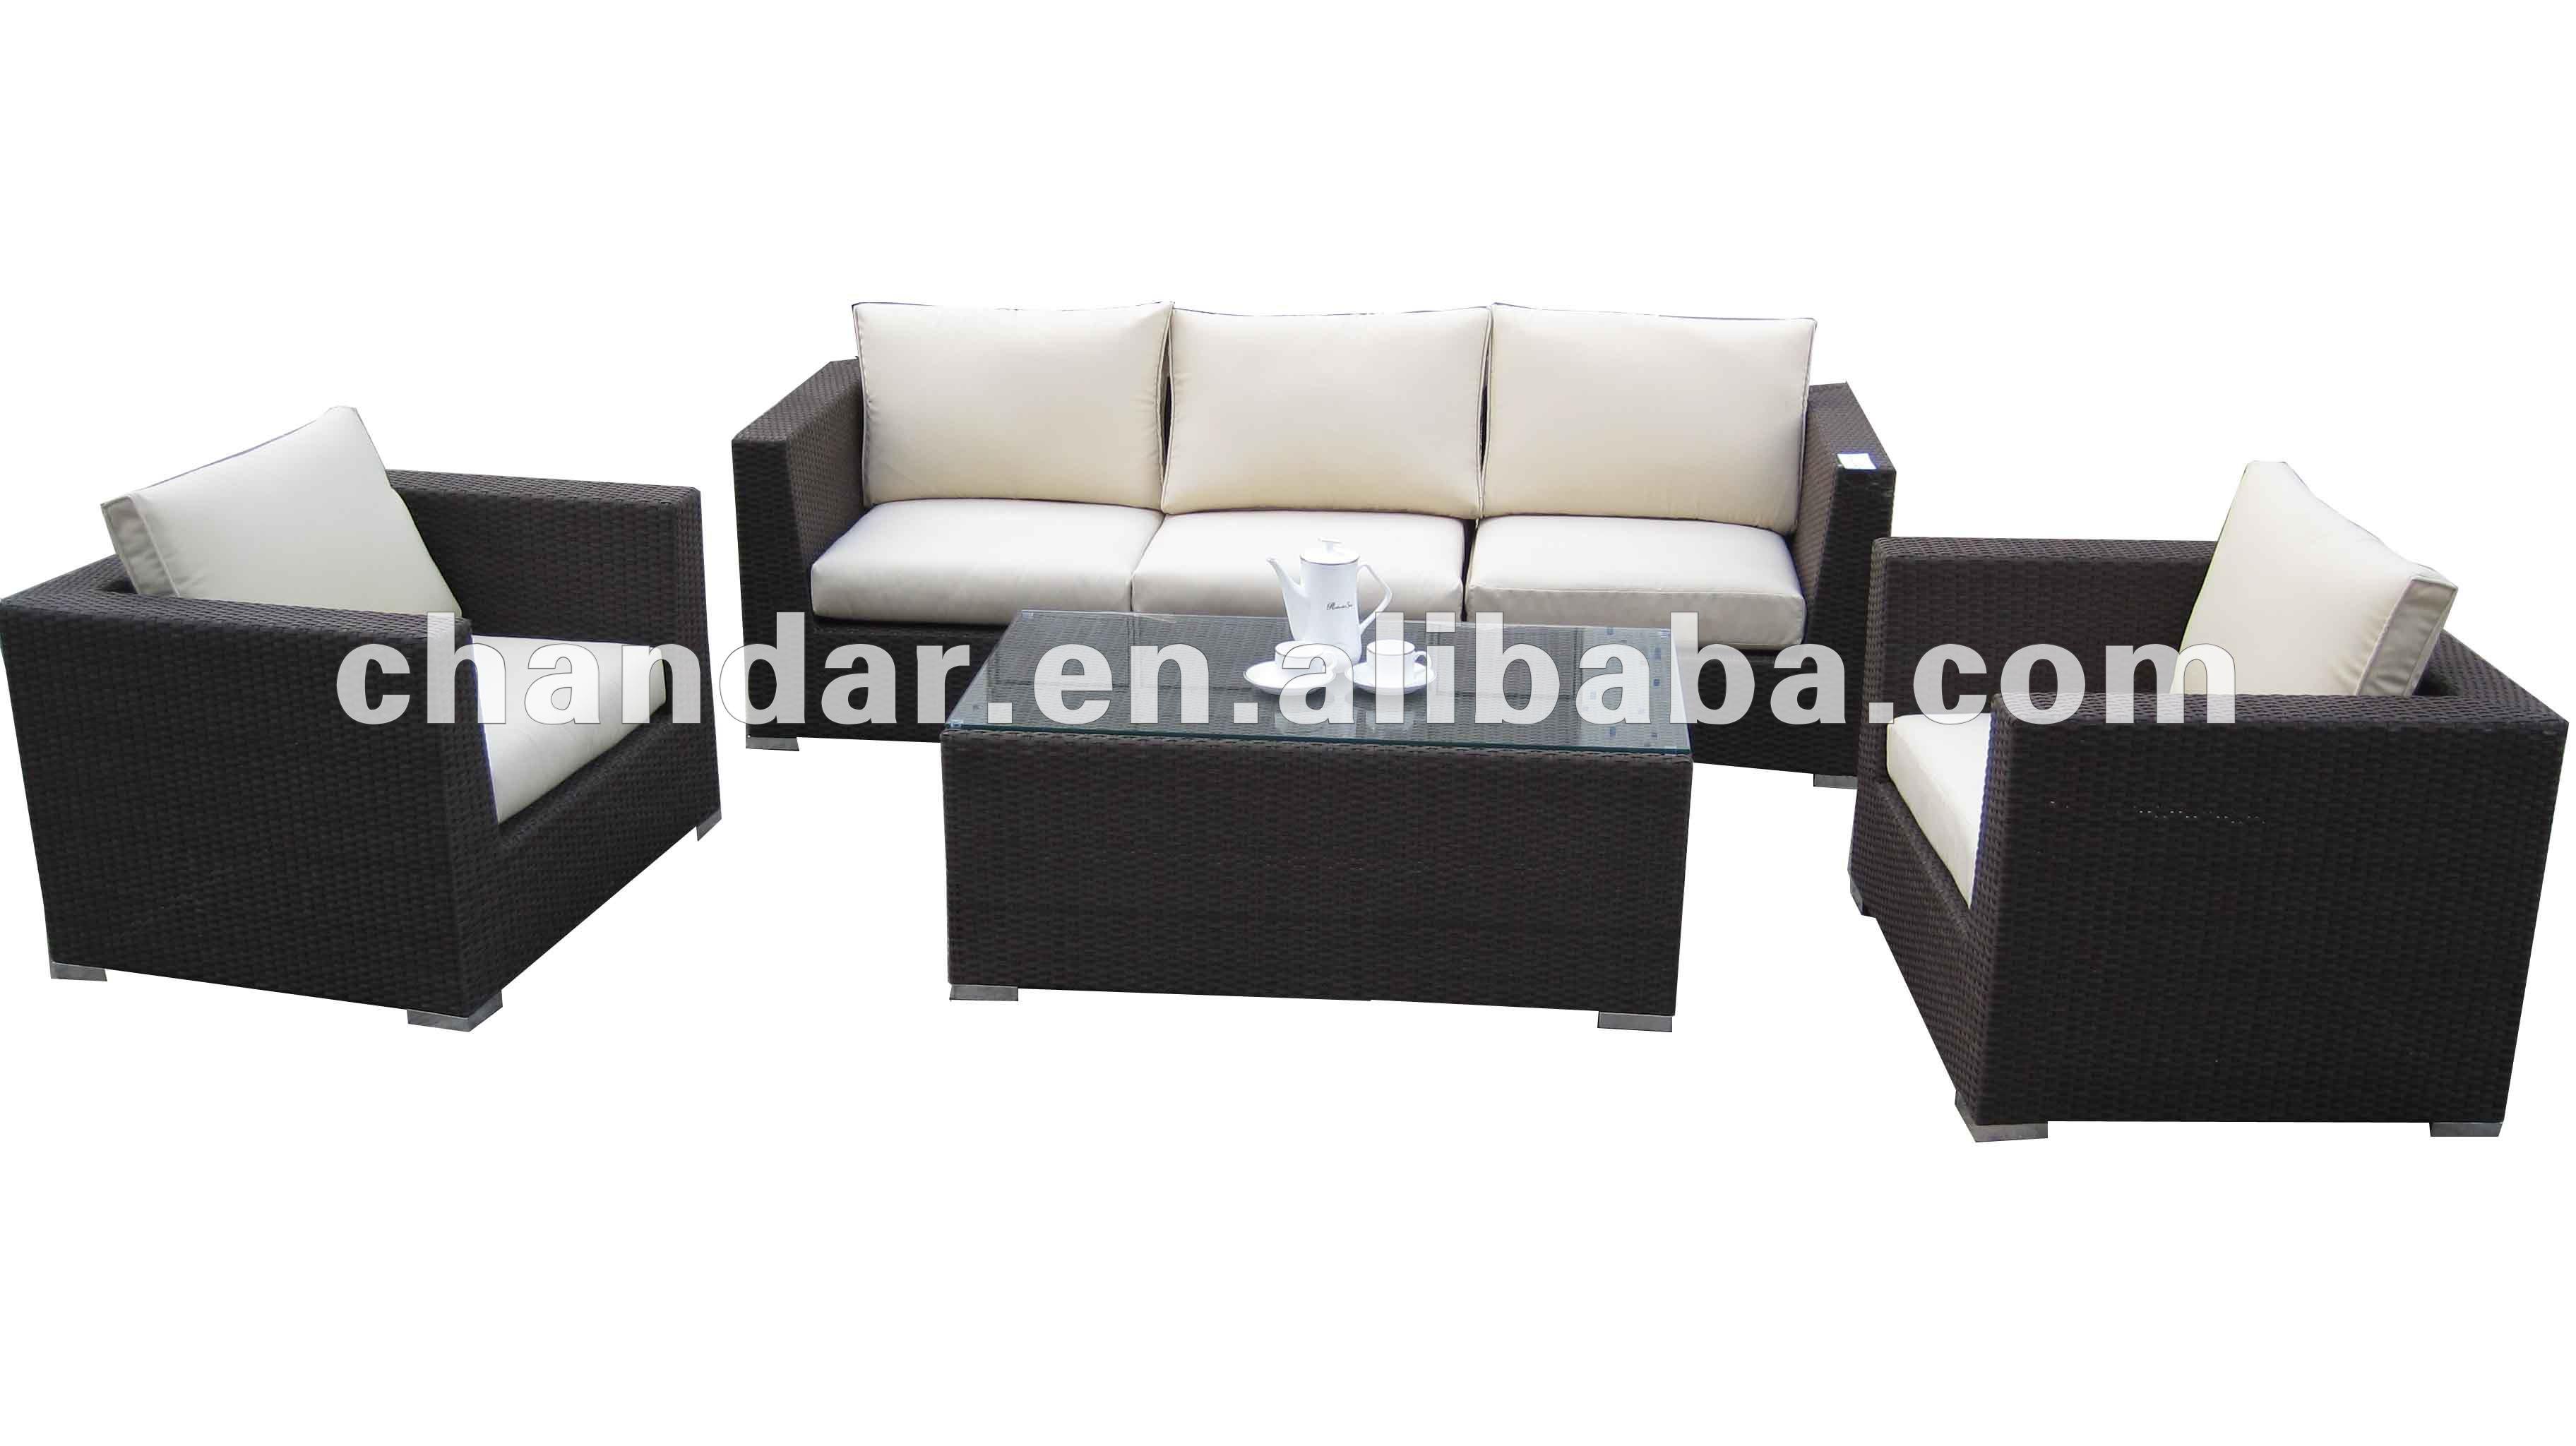 Emejing divano in rattan gallery for Sofa exterior rattan sintetico